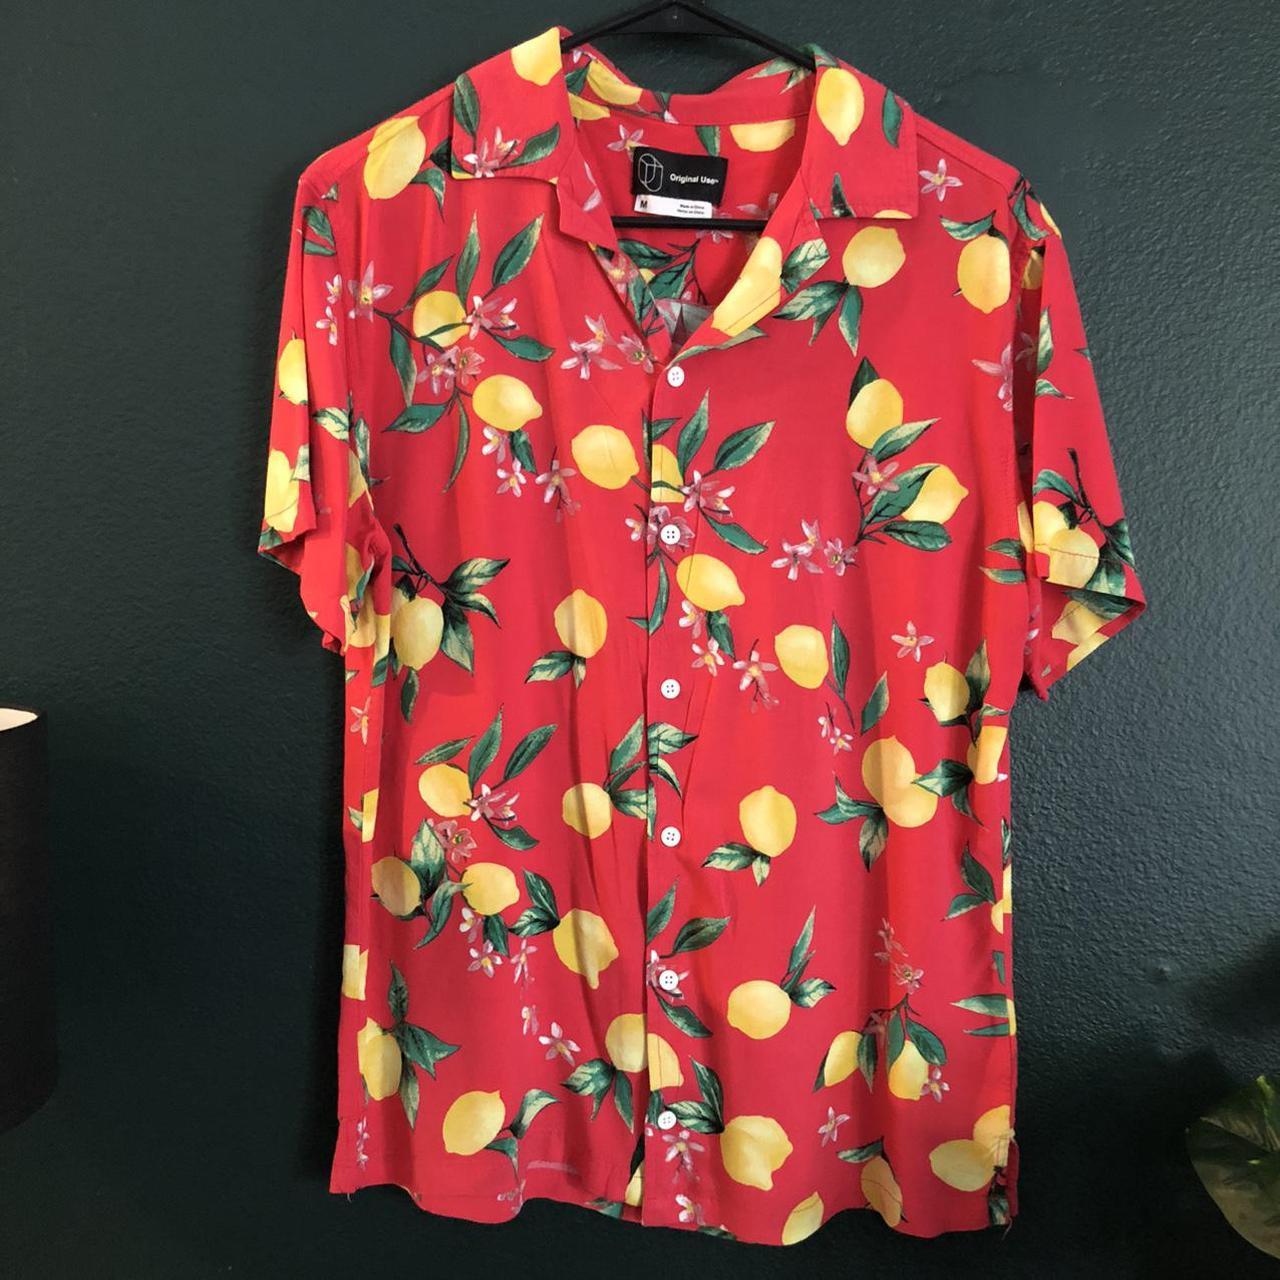 Product Image 1 - Original Use Lemon patterned button